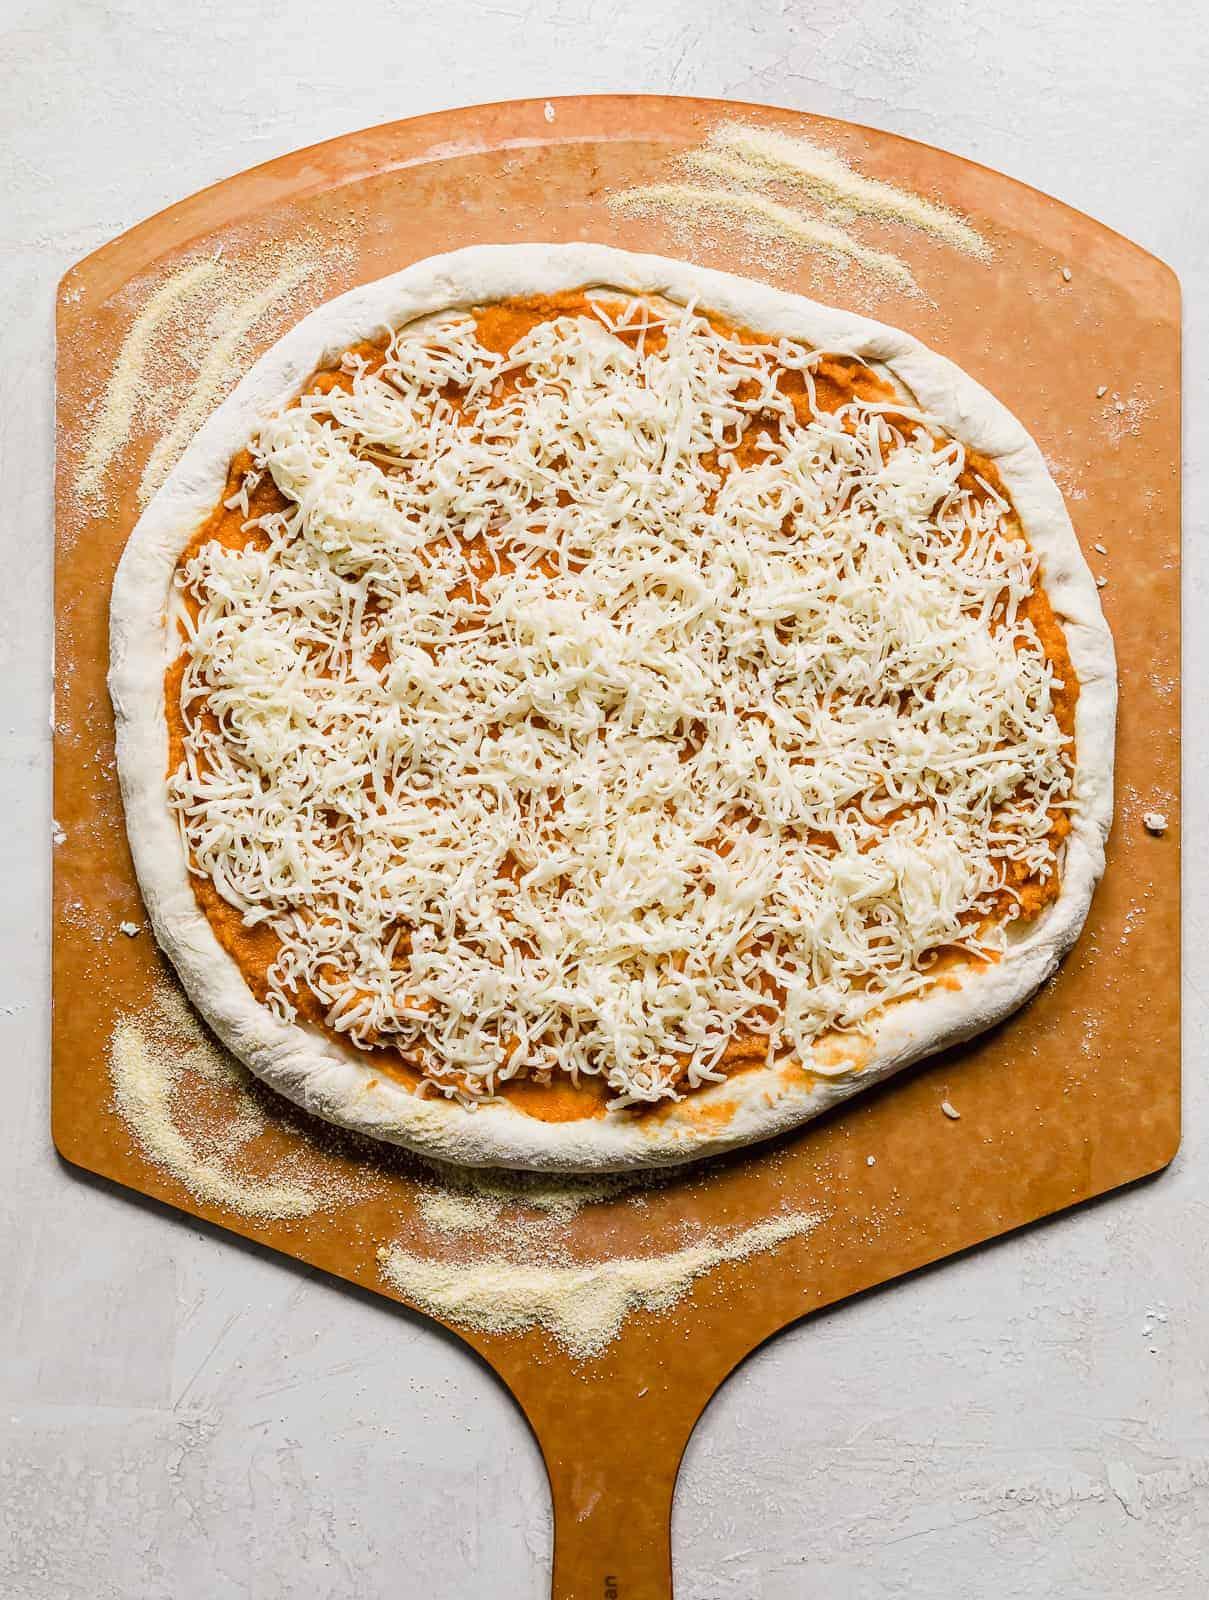 Shredded gouda cheese sprinkled over a pumpkin pizza on a pizza peel.